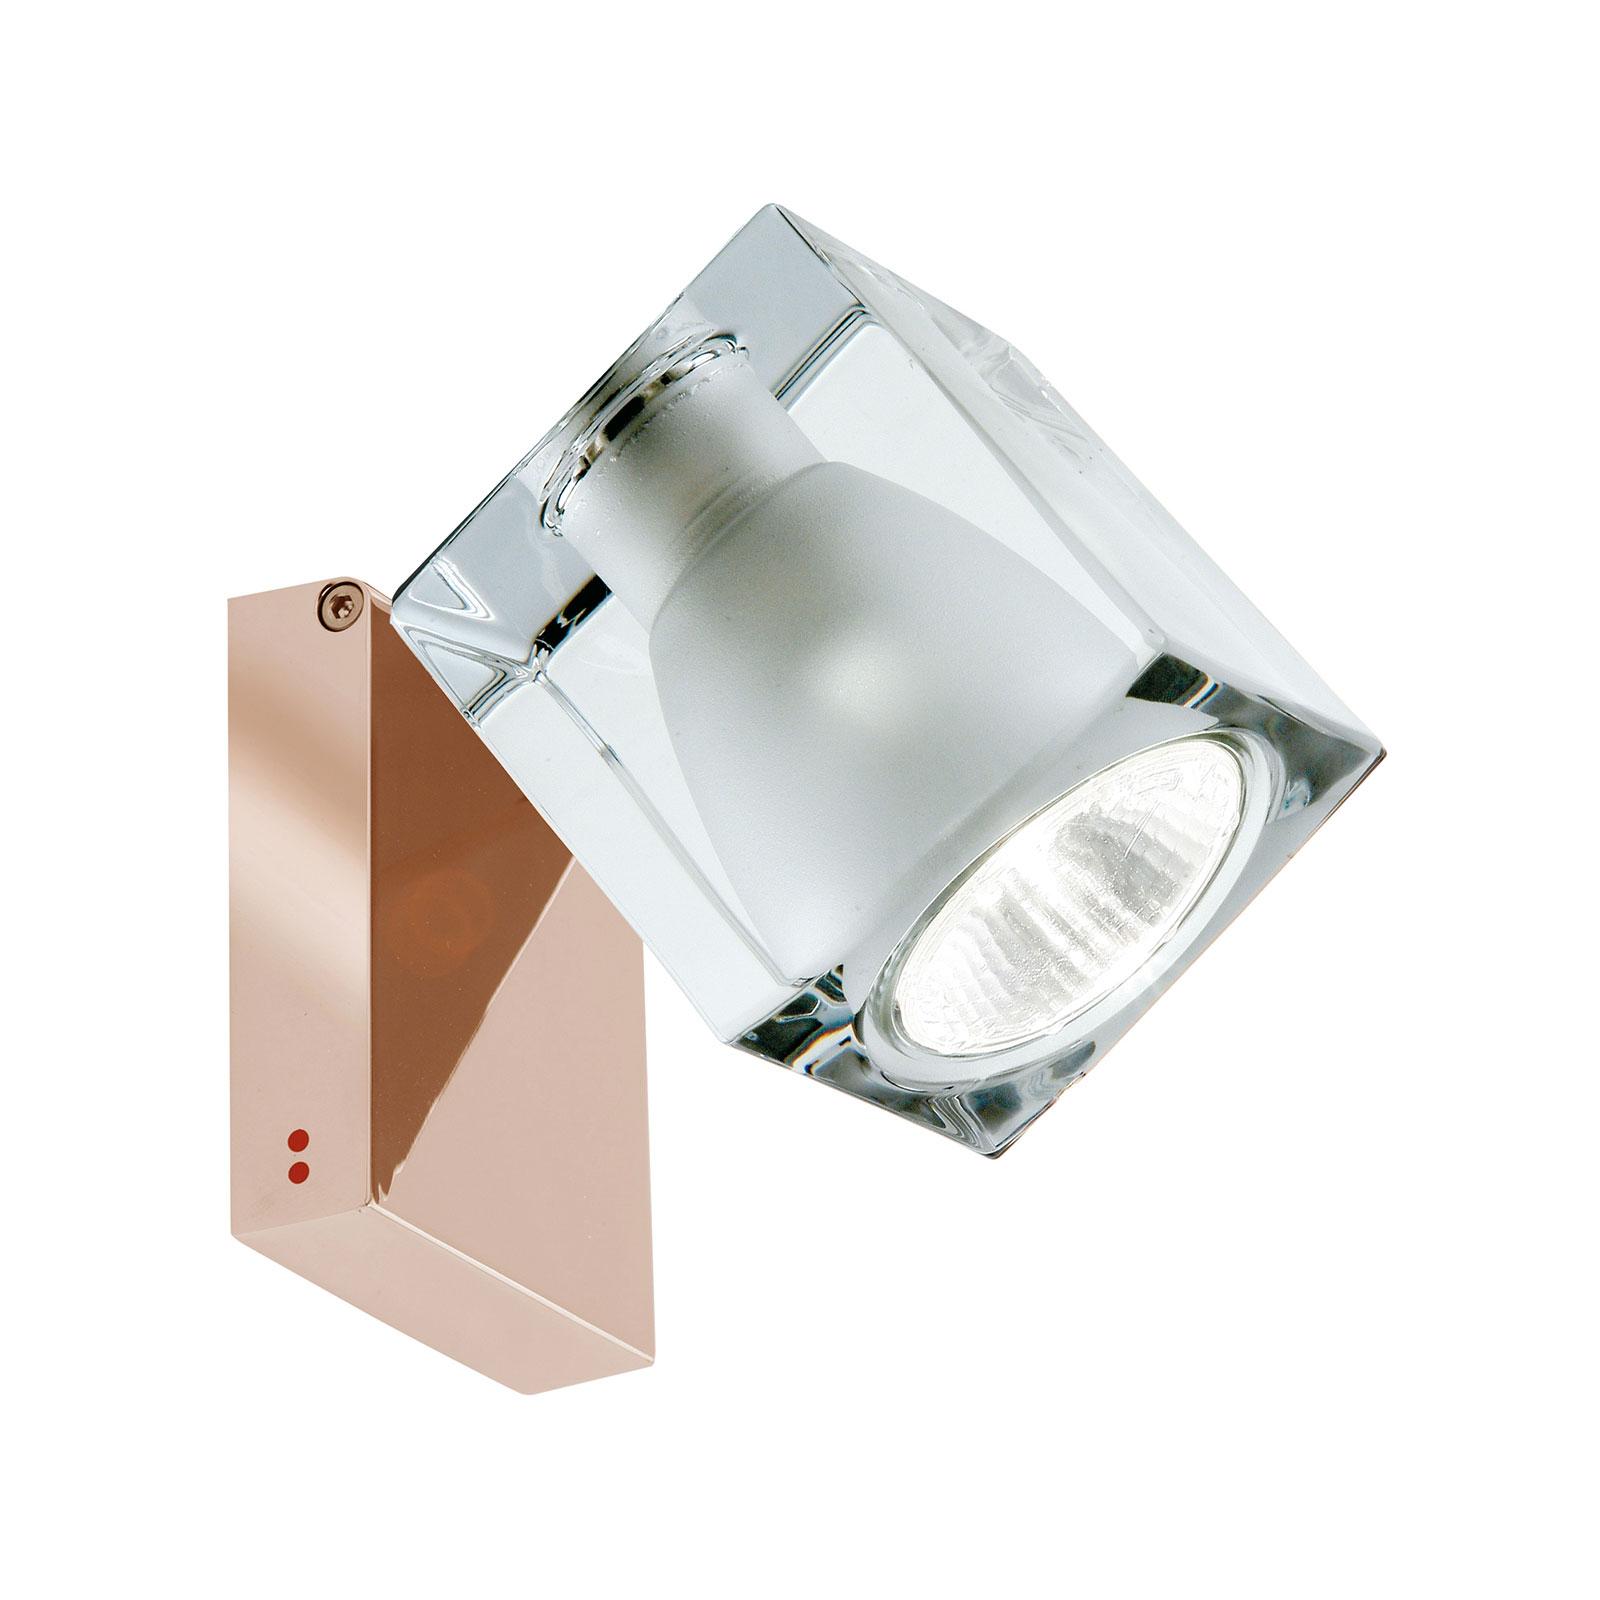 Fabbian Cubetto Wandlampe GU10 kupfer/klar